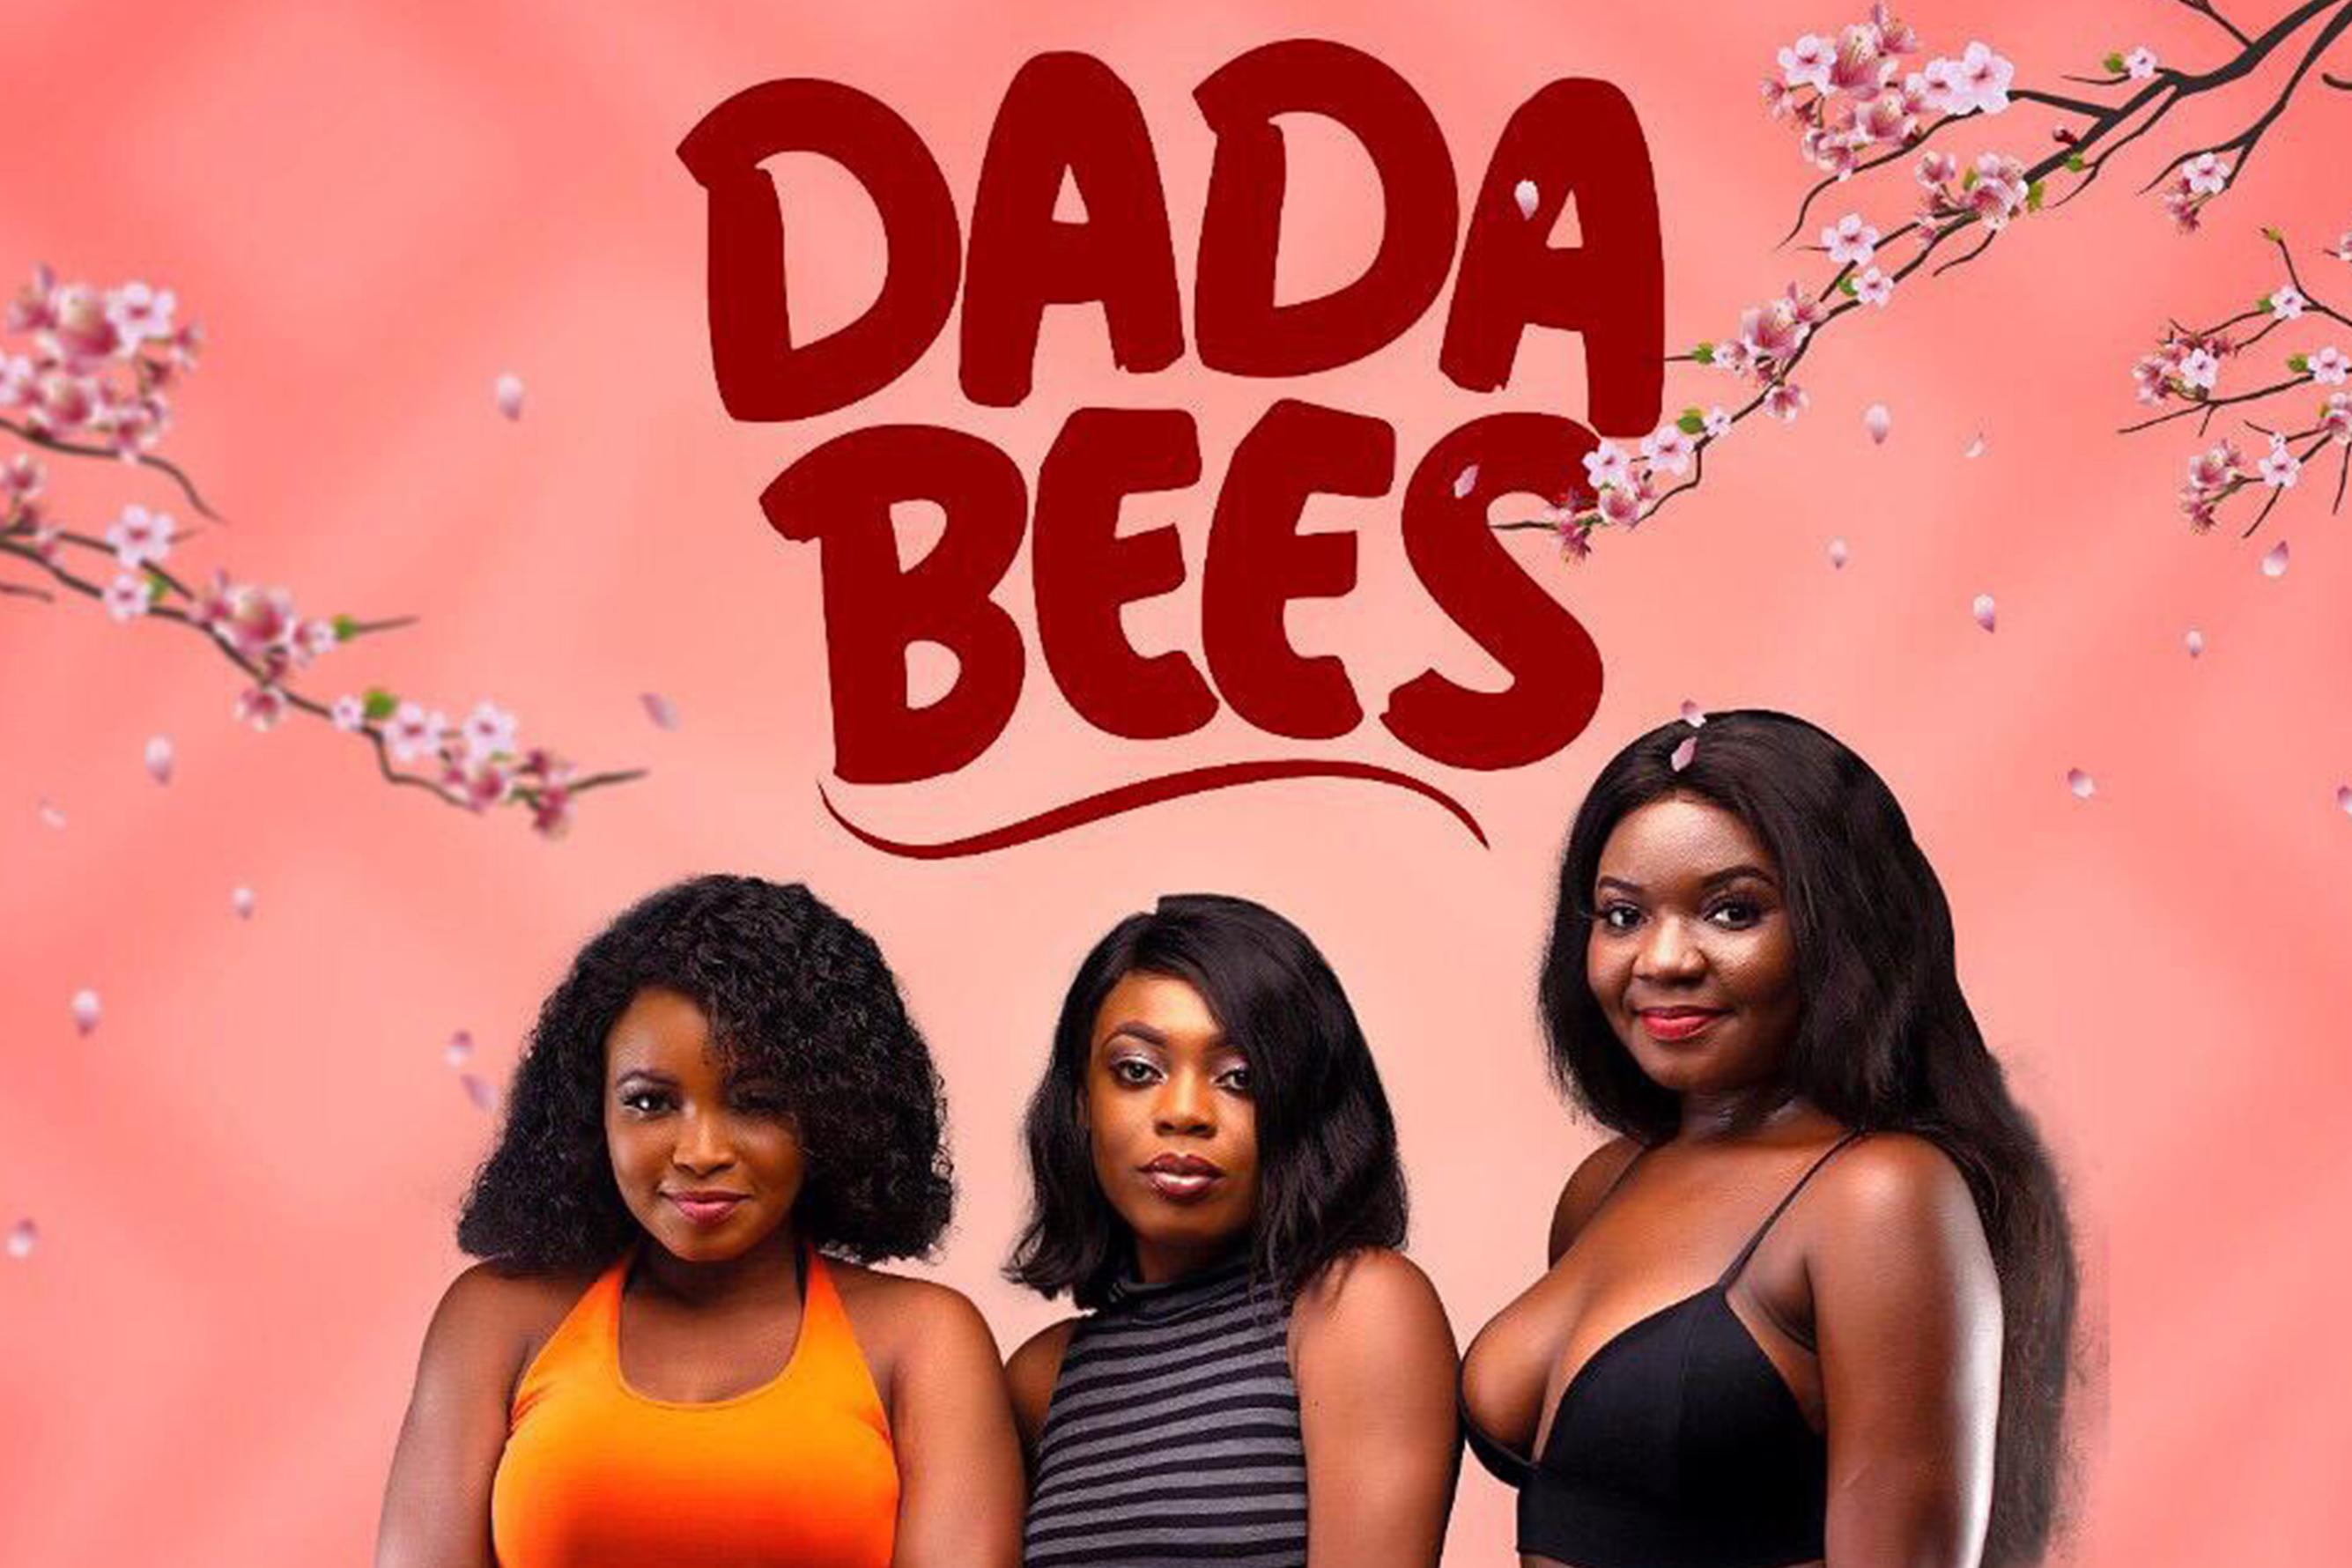 Dada Bees logo